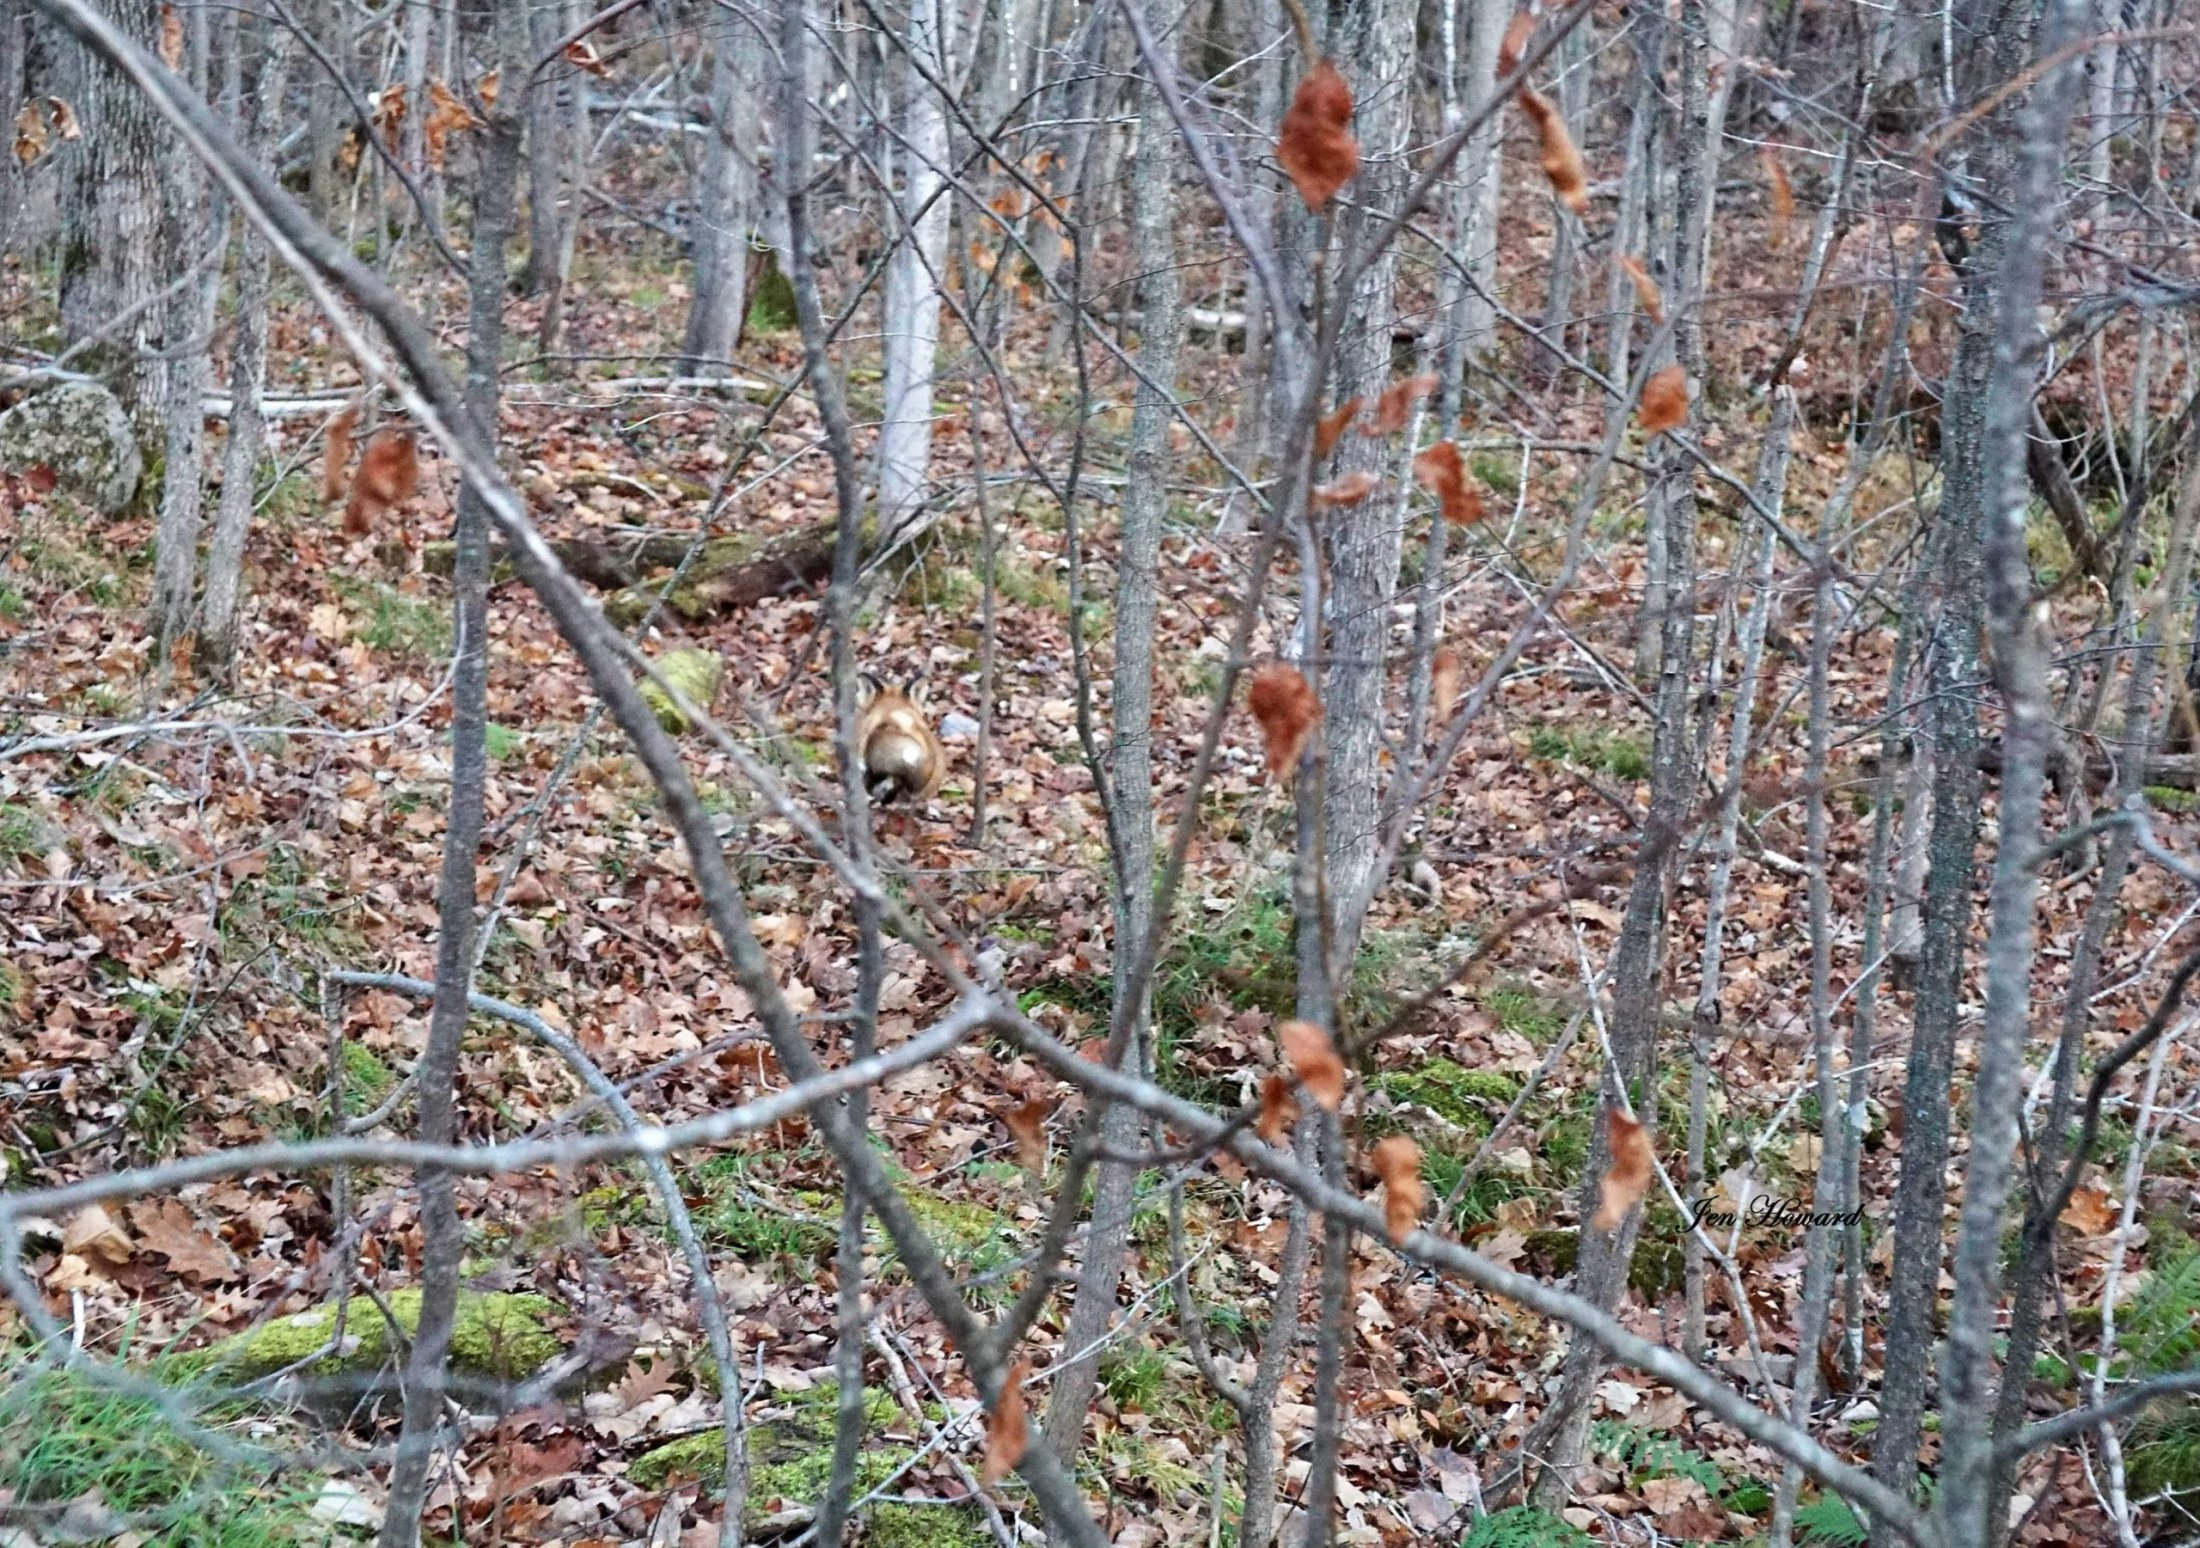 Meadow the Fox Goes Free - 11